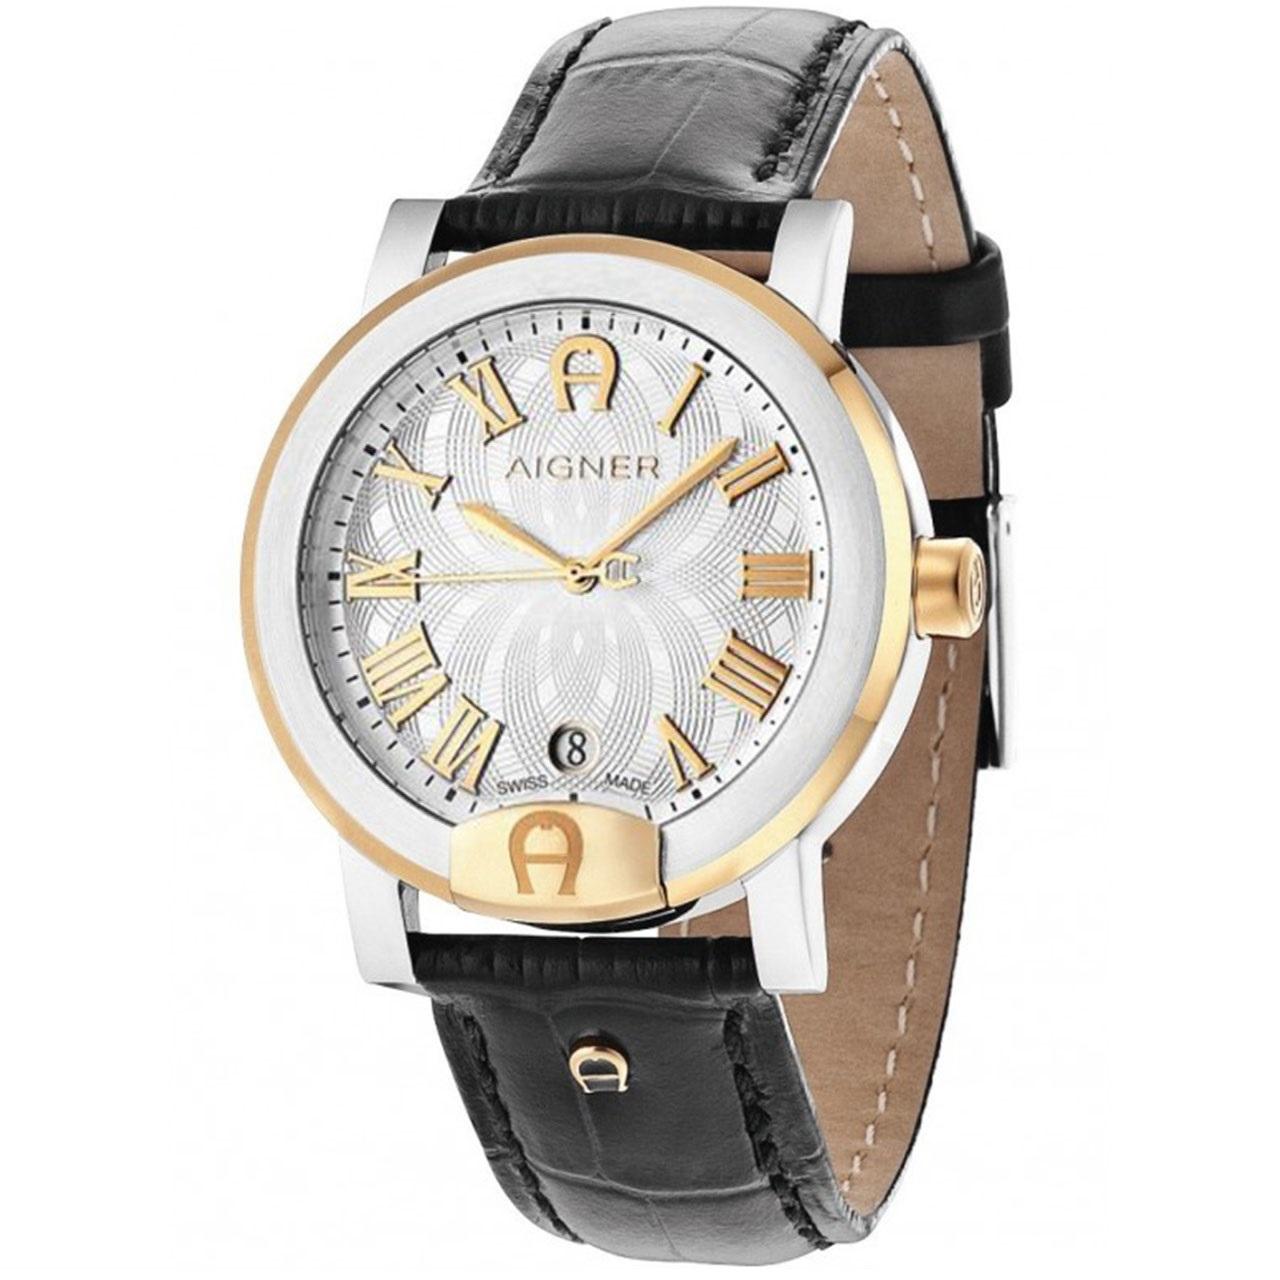 ساعت مچی عقربه ای مردانه اگنر مدل A103107 36